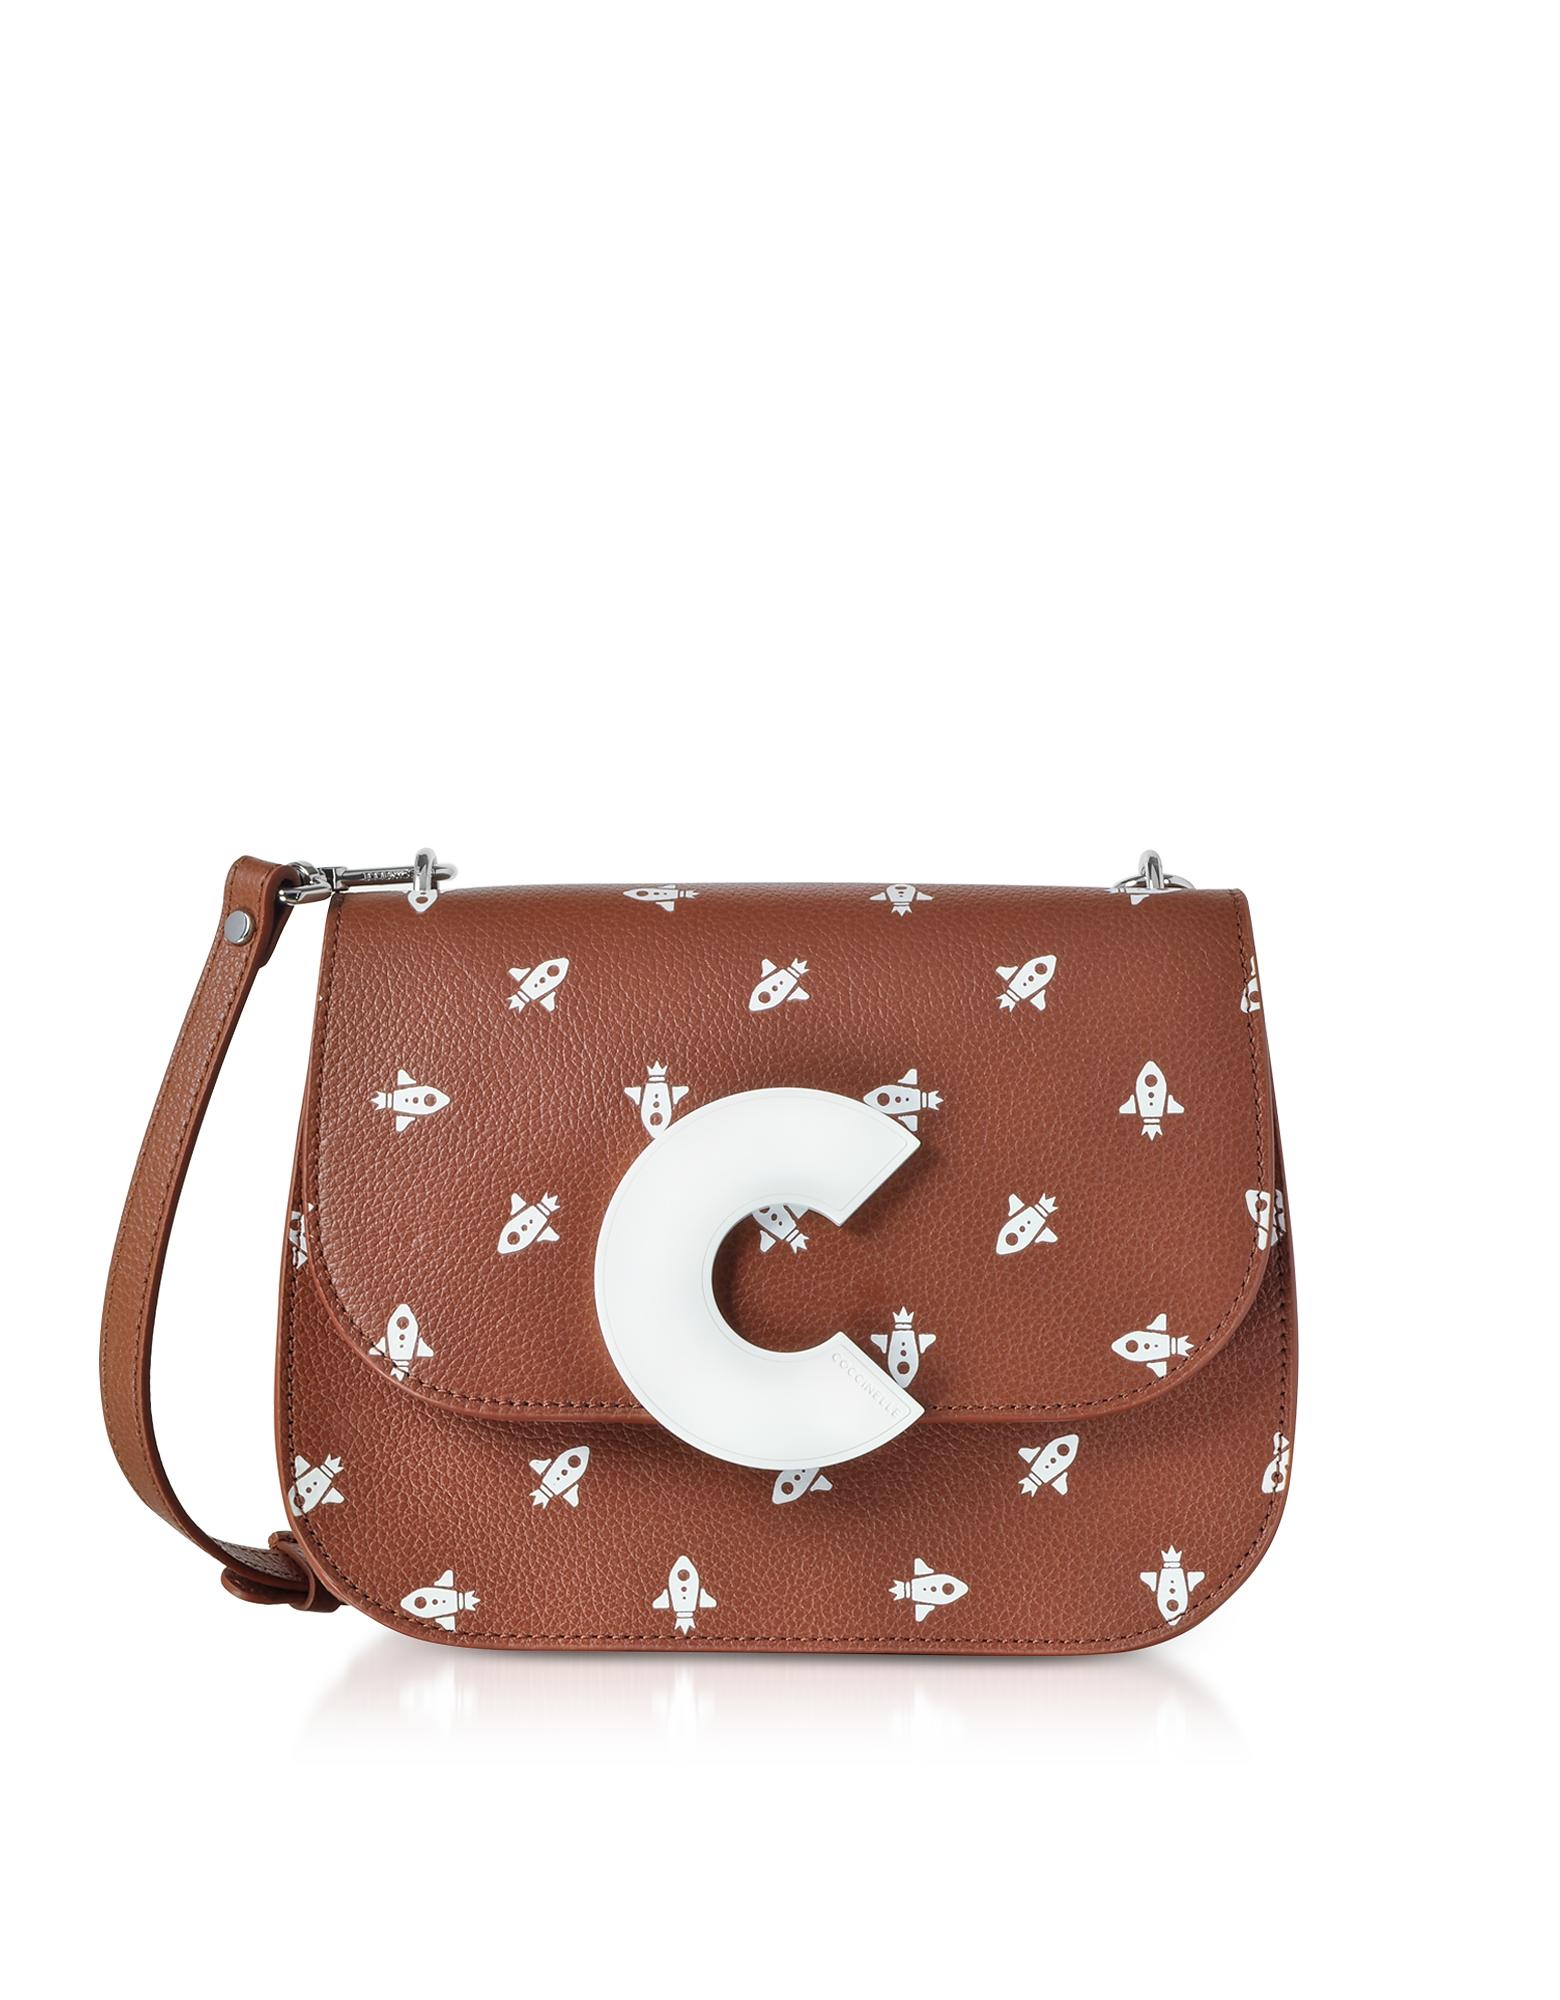 Coccinelle Handbags, Craquante Razzo Printed Leather Shoulder Bag